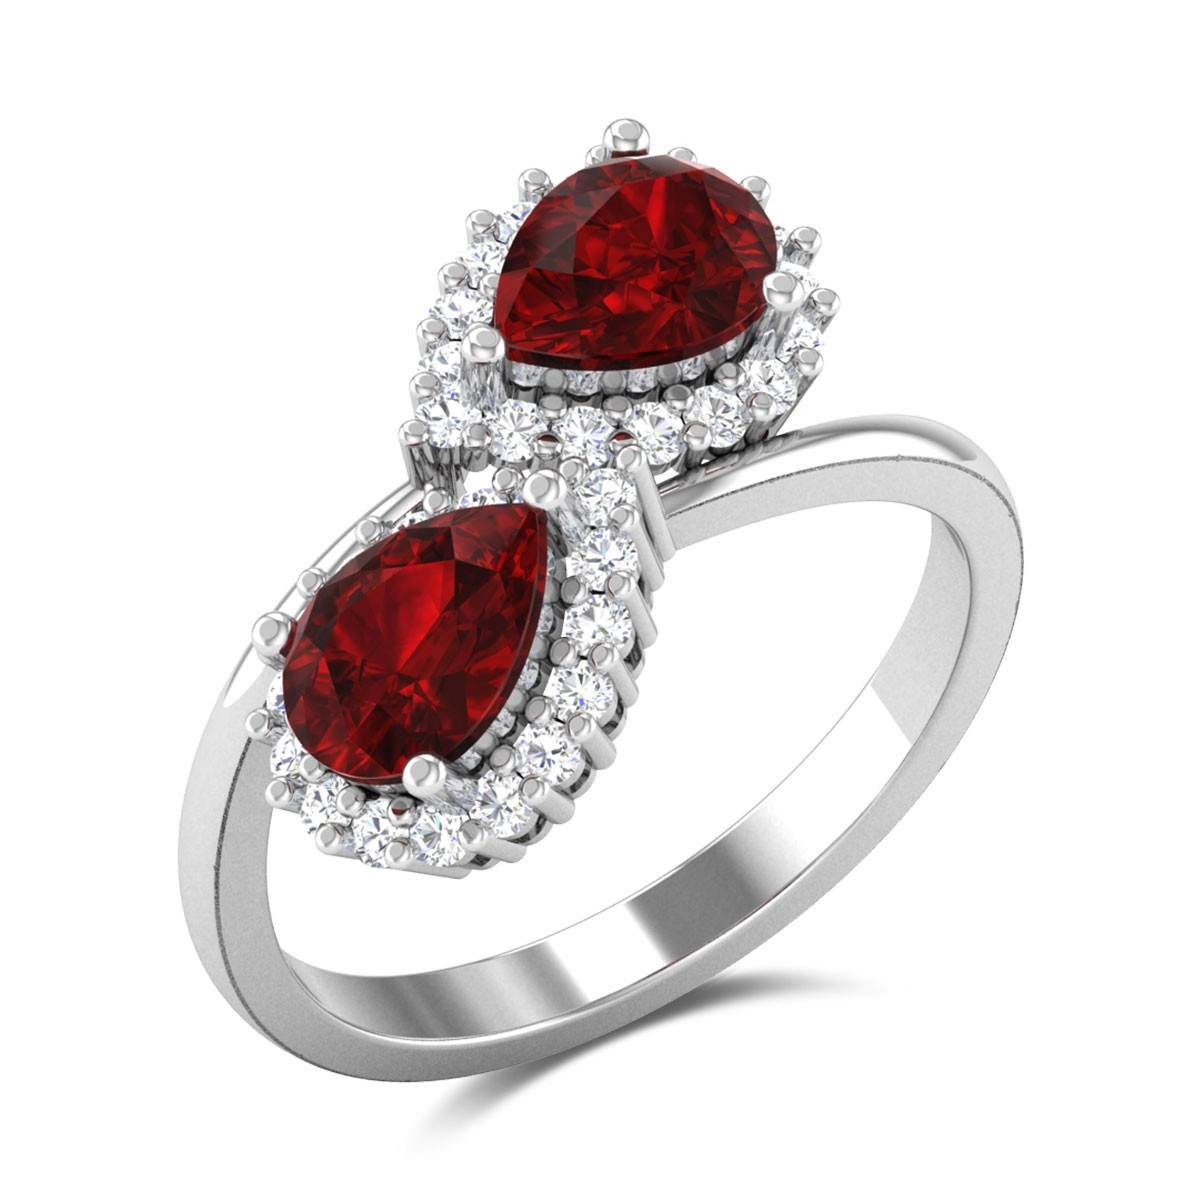 Portia Diamond Ring